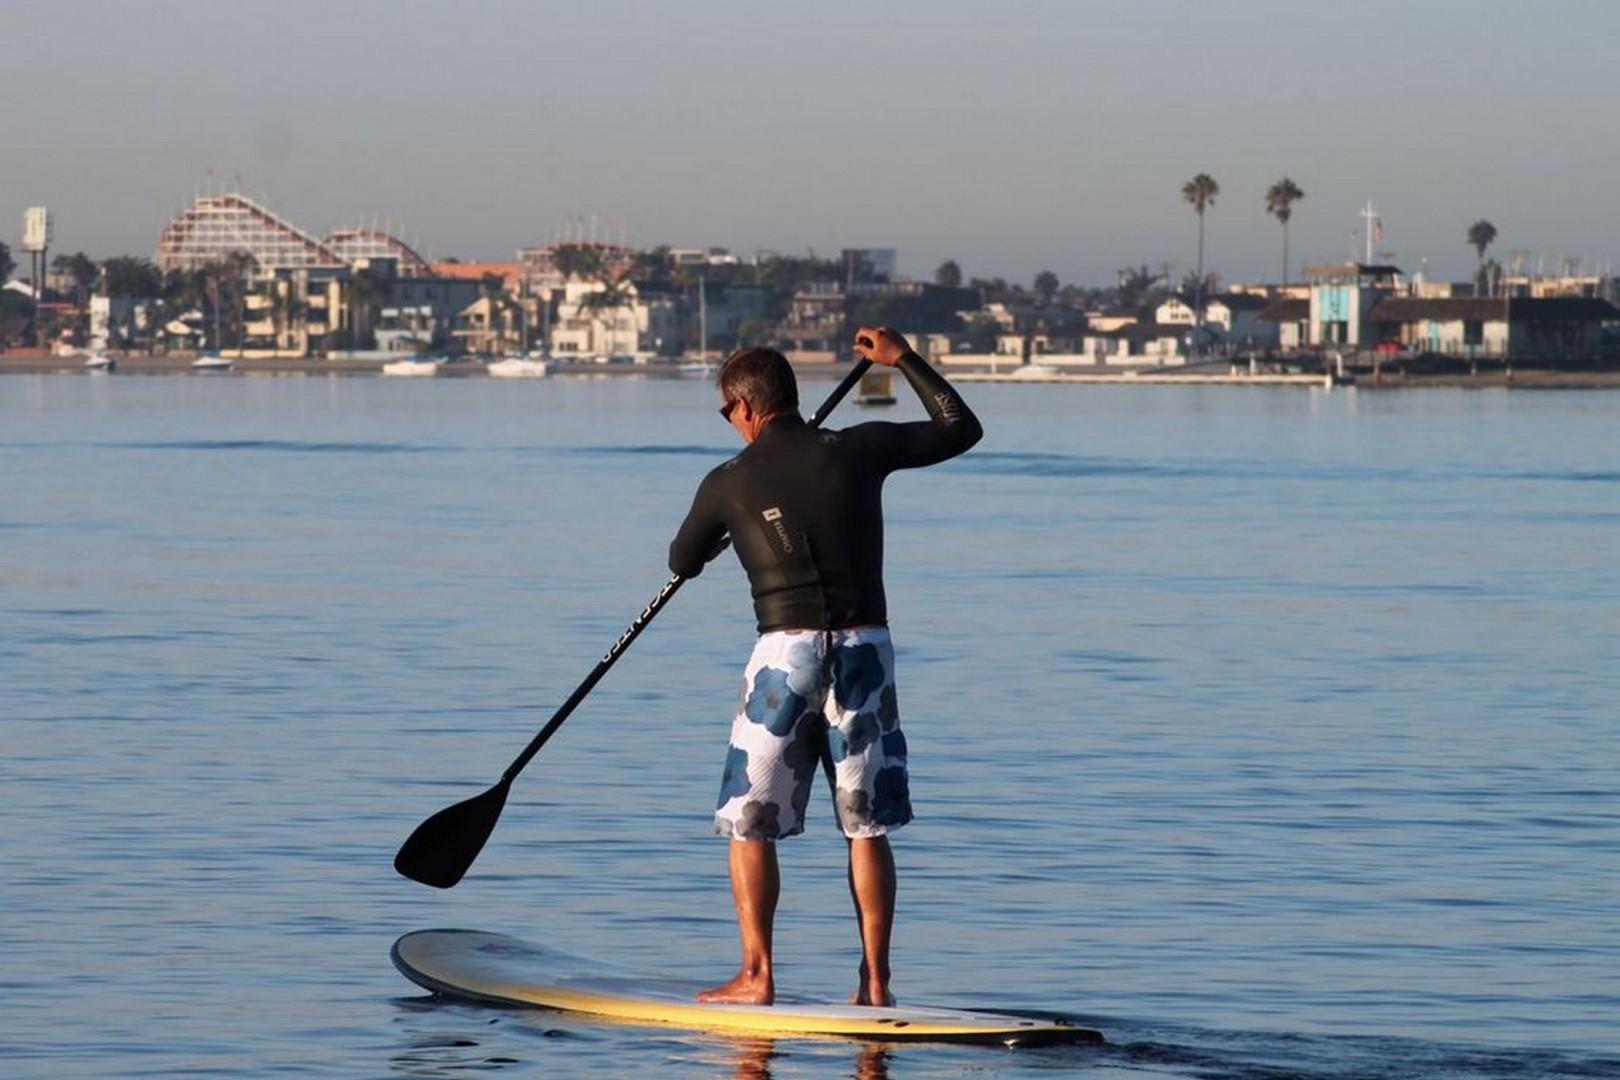 Mission Bay San Diego Paddle boarding